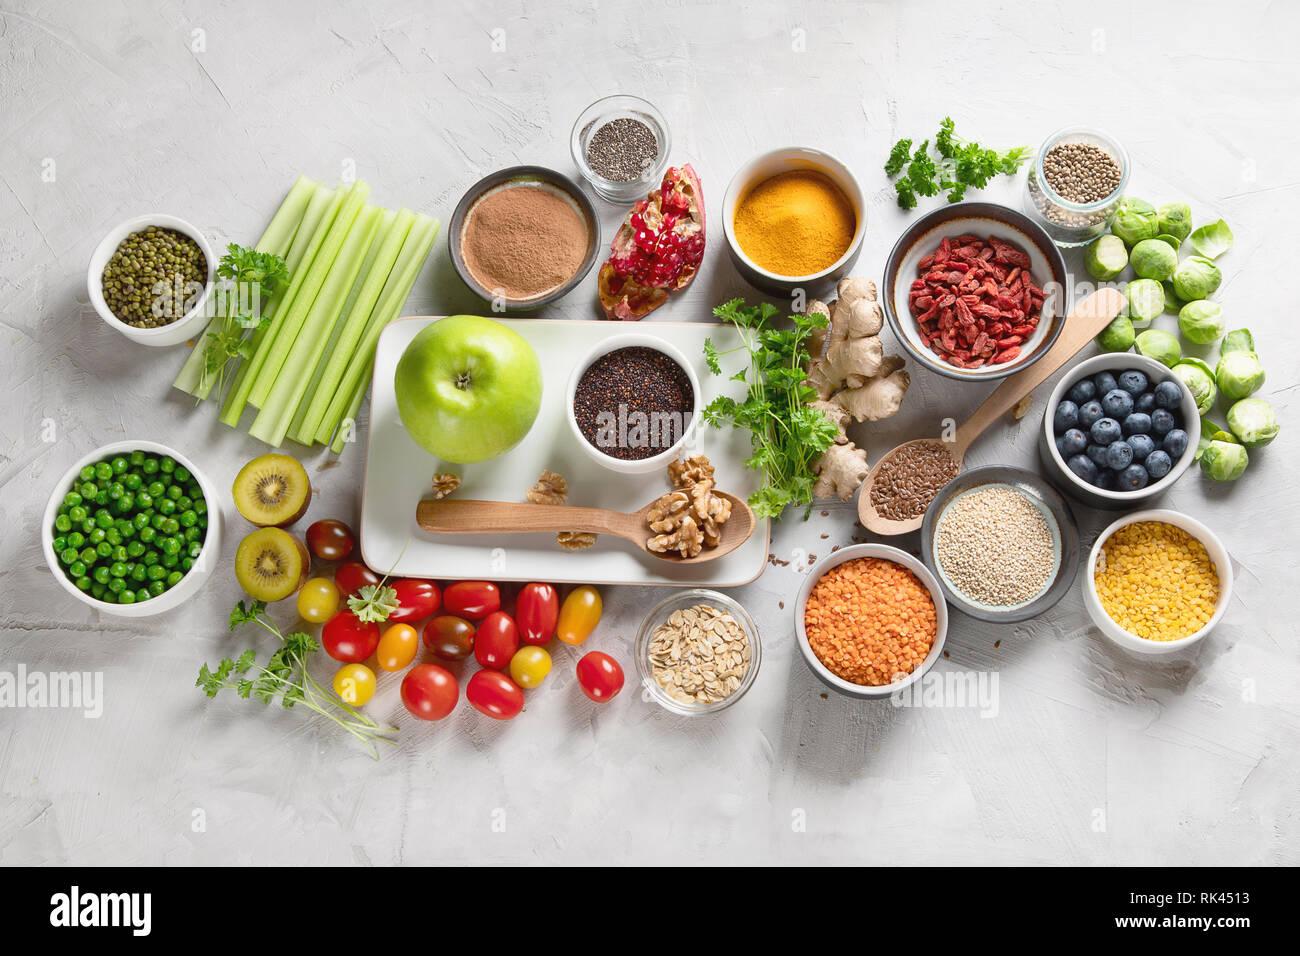 Vegetables, fruit, grain, superfoods for vegan and vegetarian eating. Clean eating. Detox, dieting food concept Stock Photo